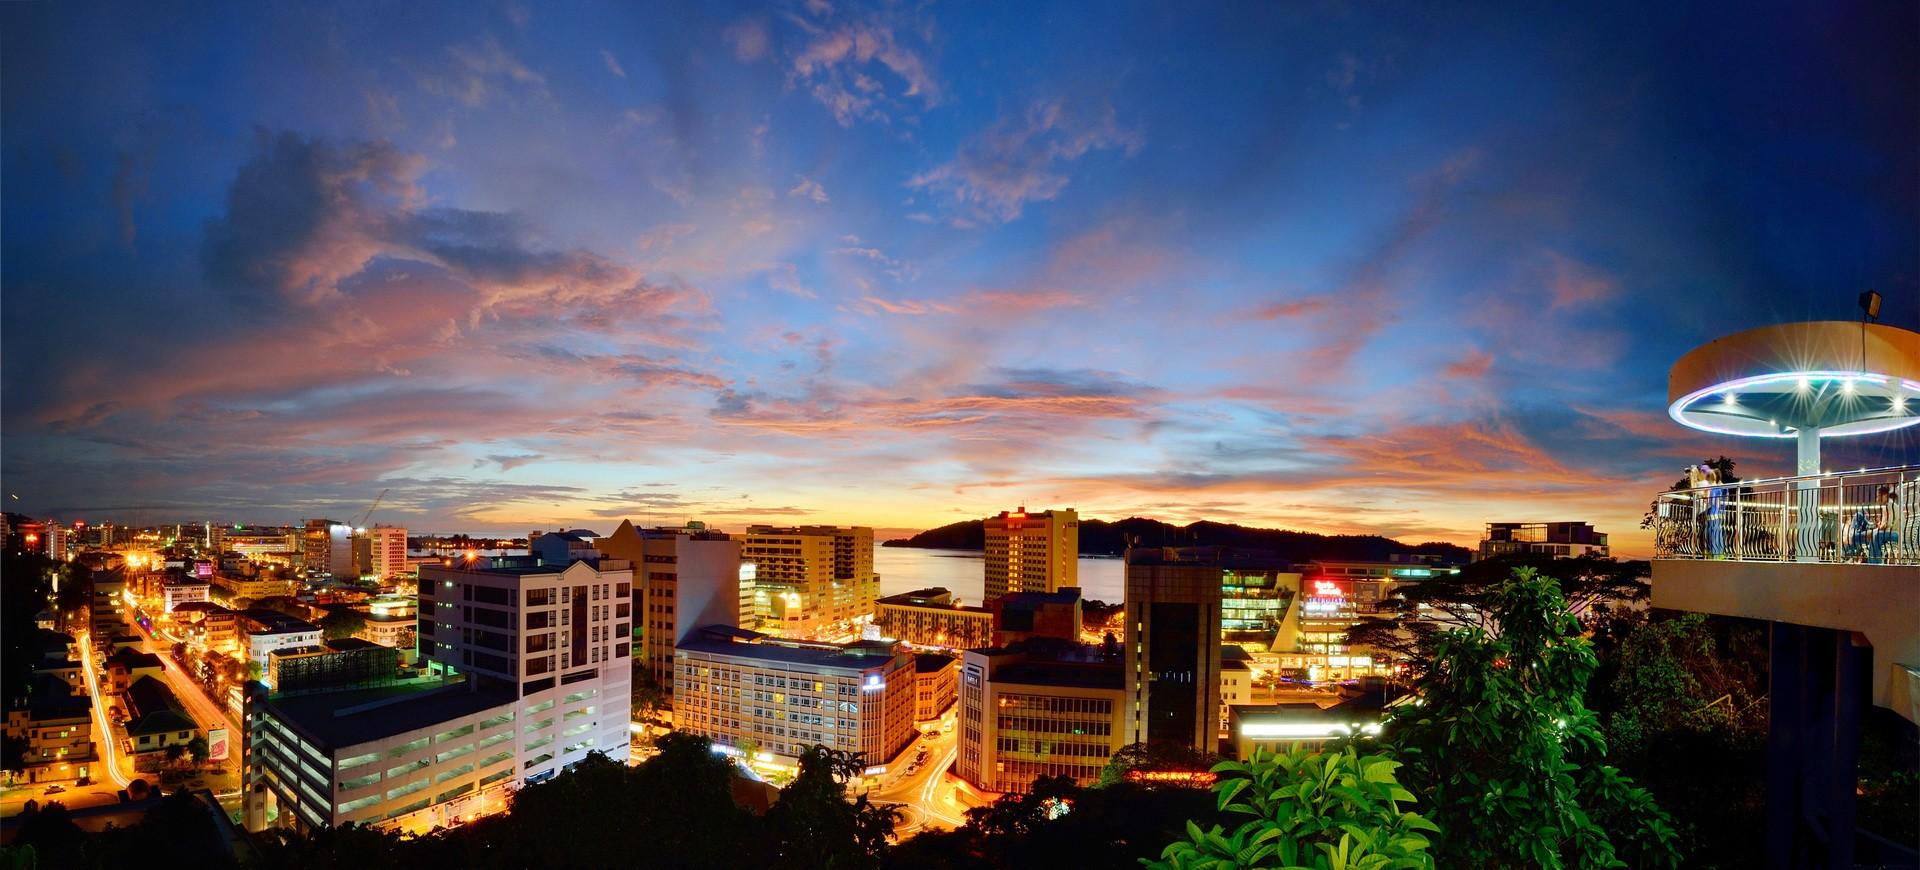 Malaisie Sabah Kota Kinabalu Panorama by night